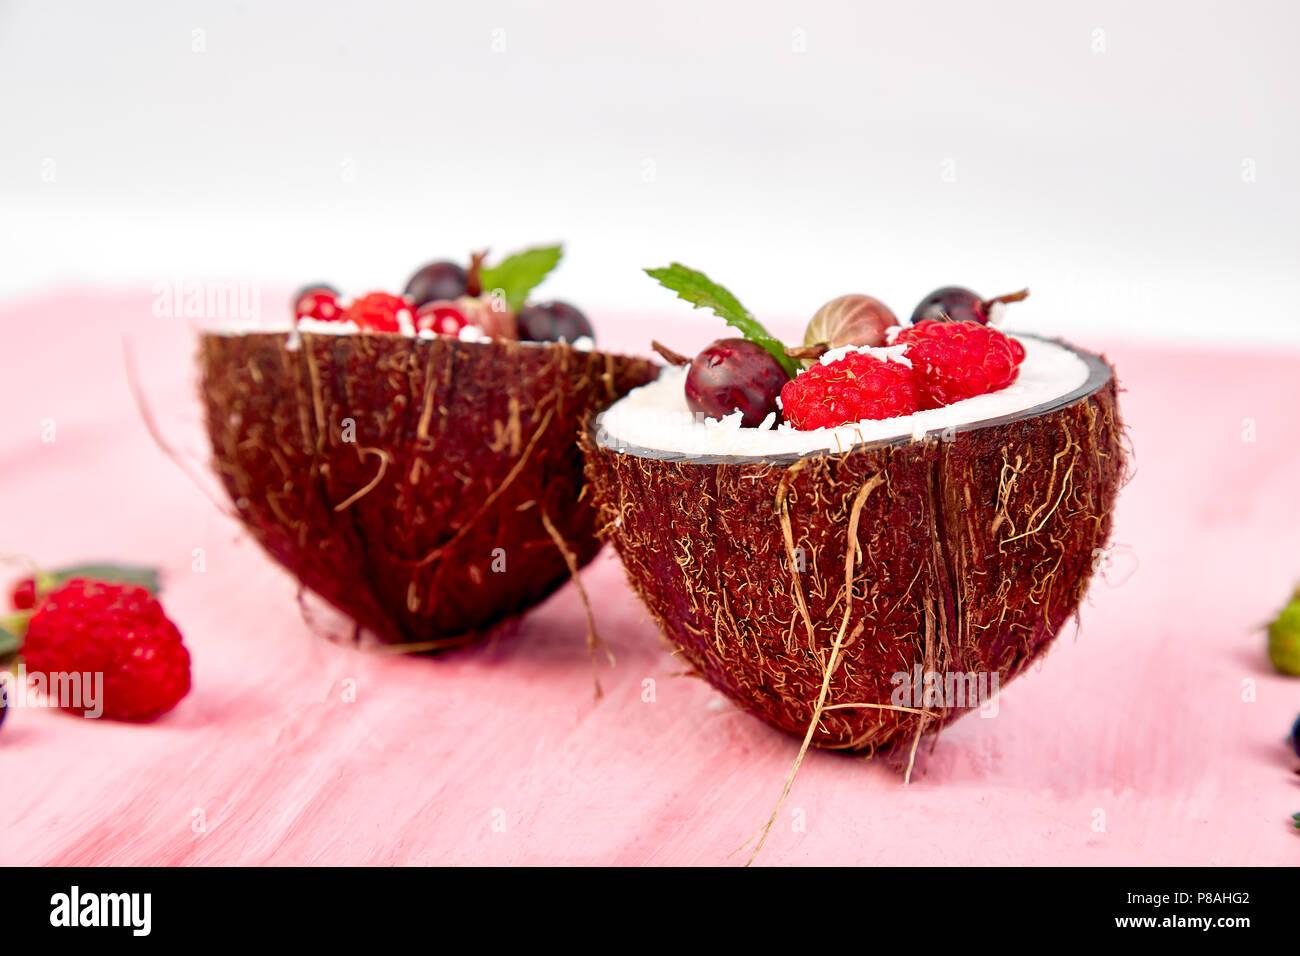 Obstsalat Agrus Stachelbeeren Rasbberry In Kokosnuss Schale